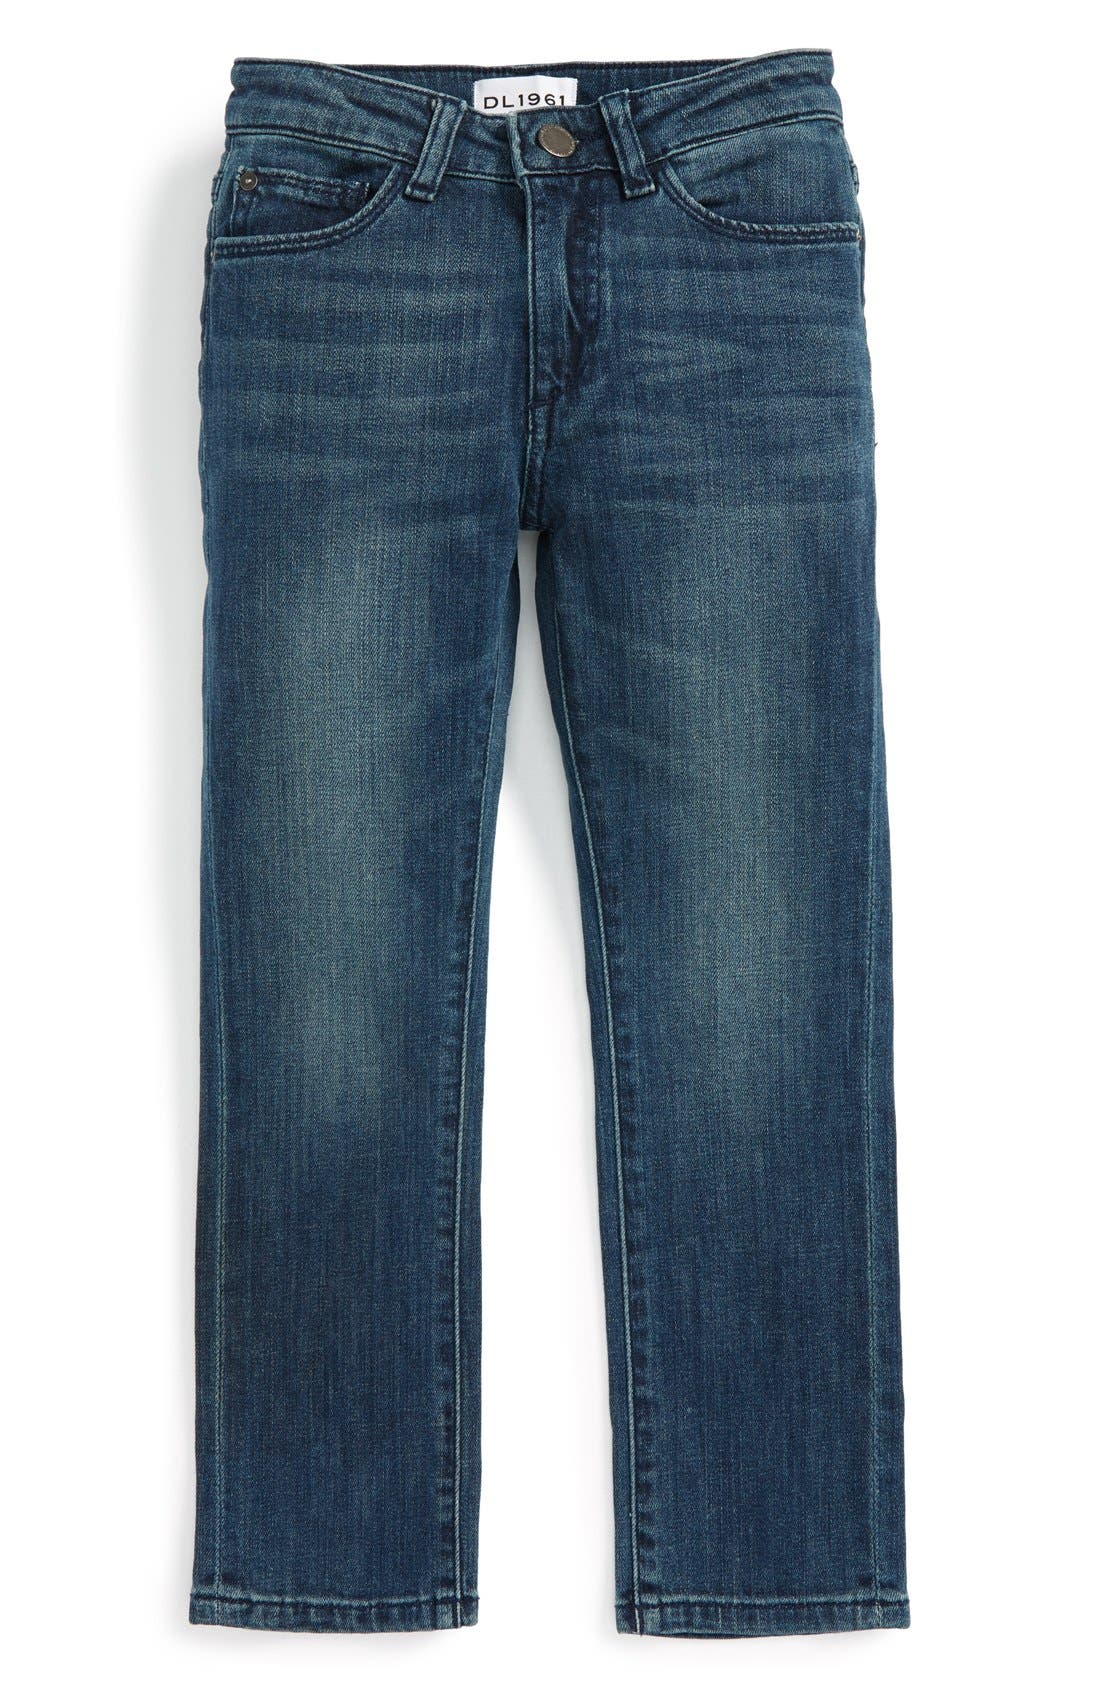 DL1961 Hawke Skinny Jeans